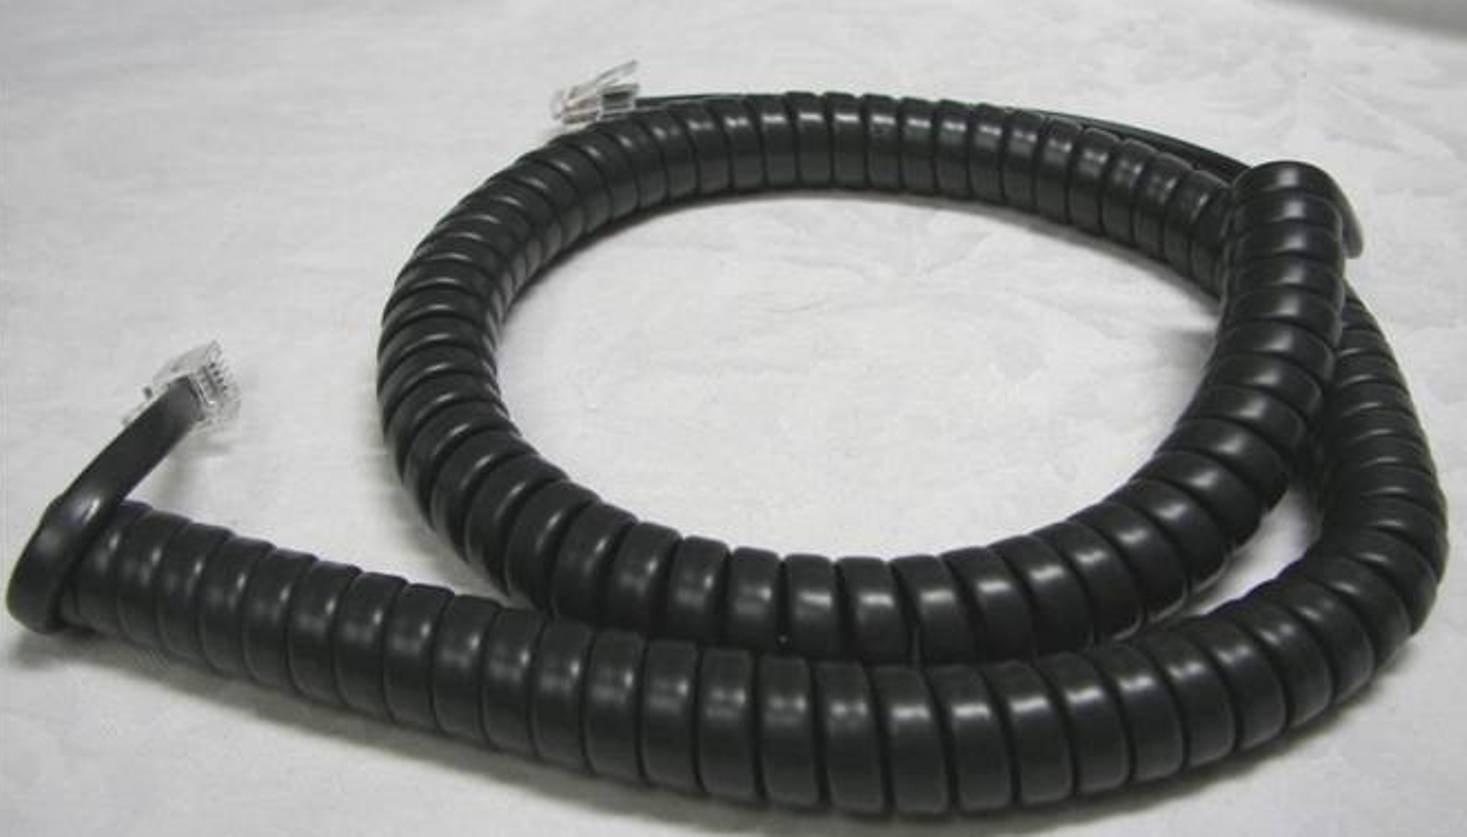 50 Pack of Charcoal (aka Black) 12' Ft Handset Cords for Avaya IP Phone J100 9600 Series Digital 9400 9500 9608 9608G 9610 9610G 9611G 9620 9620L 9630 9641GS 9650C IX Curly Coil Lot by DIY-BizPhones by DIY-BizPhones